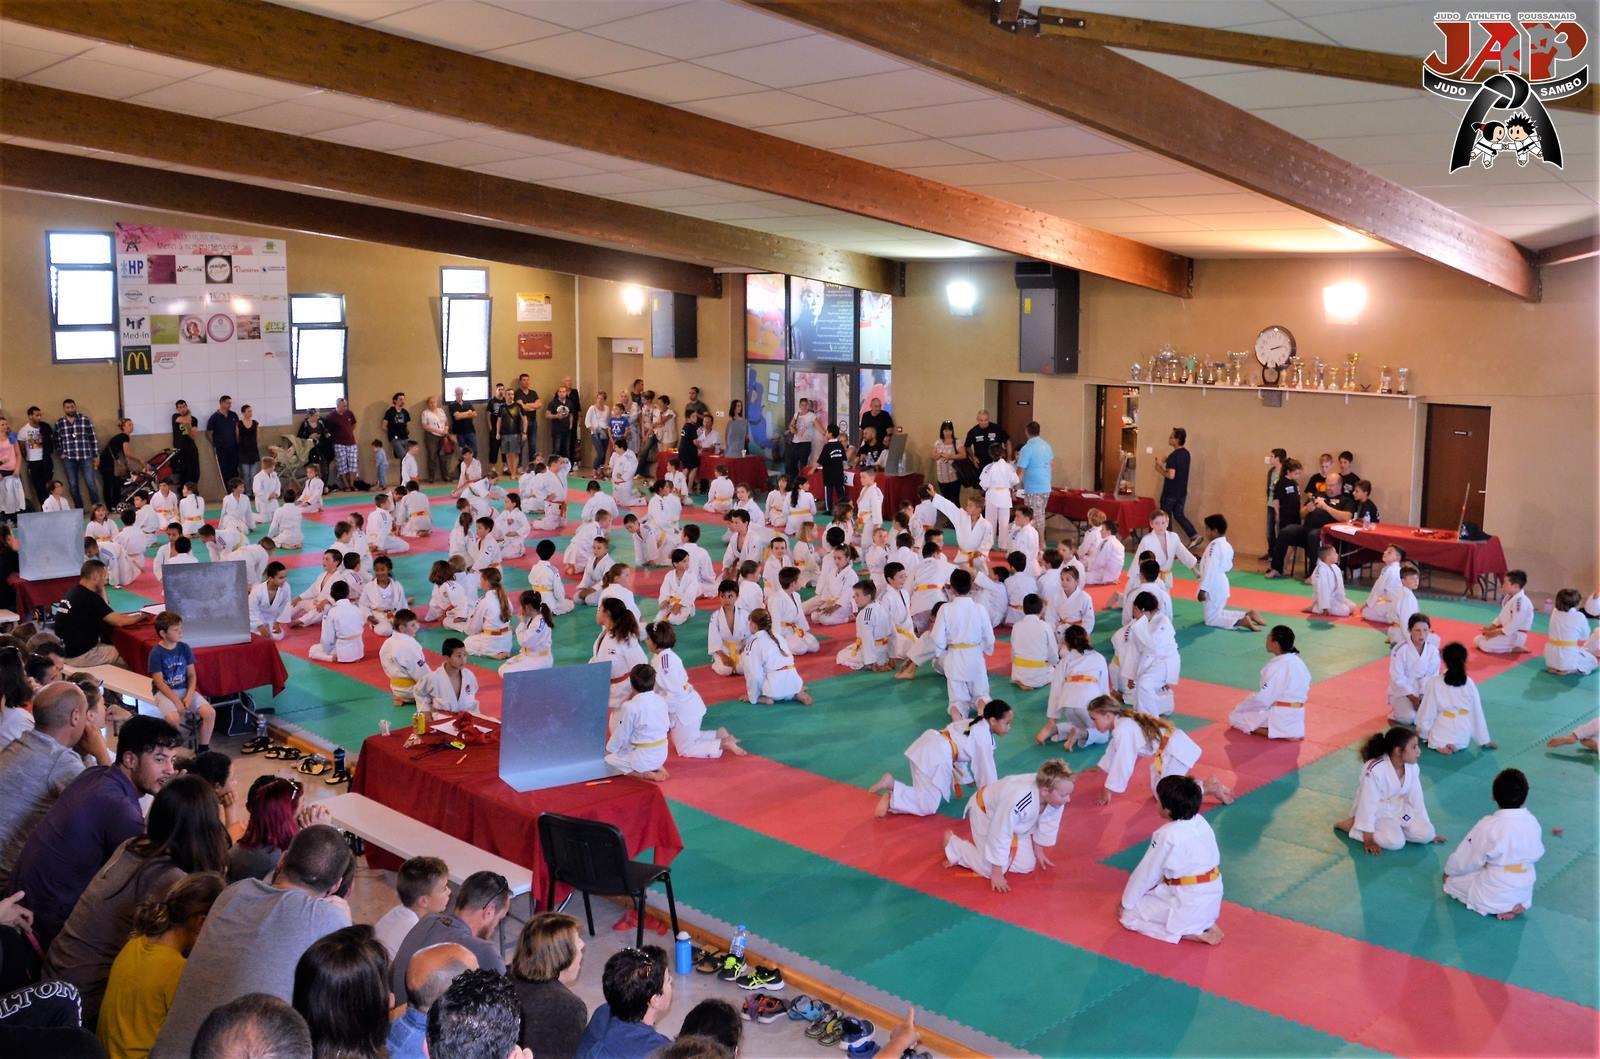 http://www.jap-poussan.fr/wp-content/uploads/2017/08/18556525_1898374813769770_9208577903341518386_o.jpg